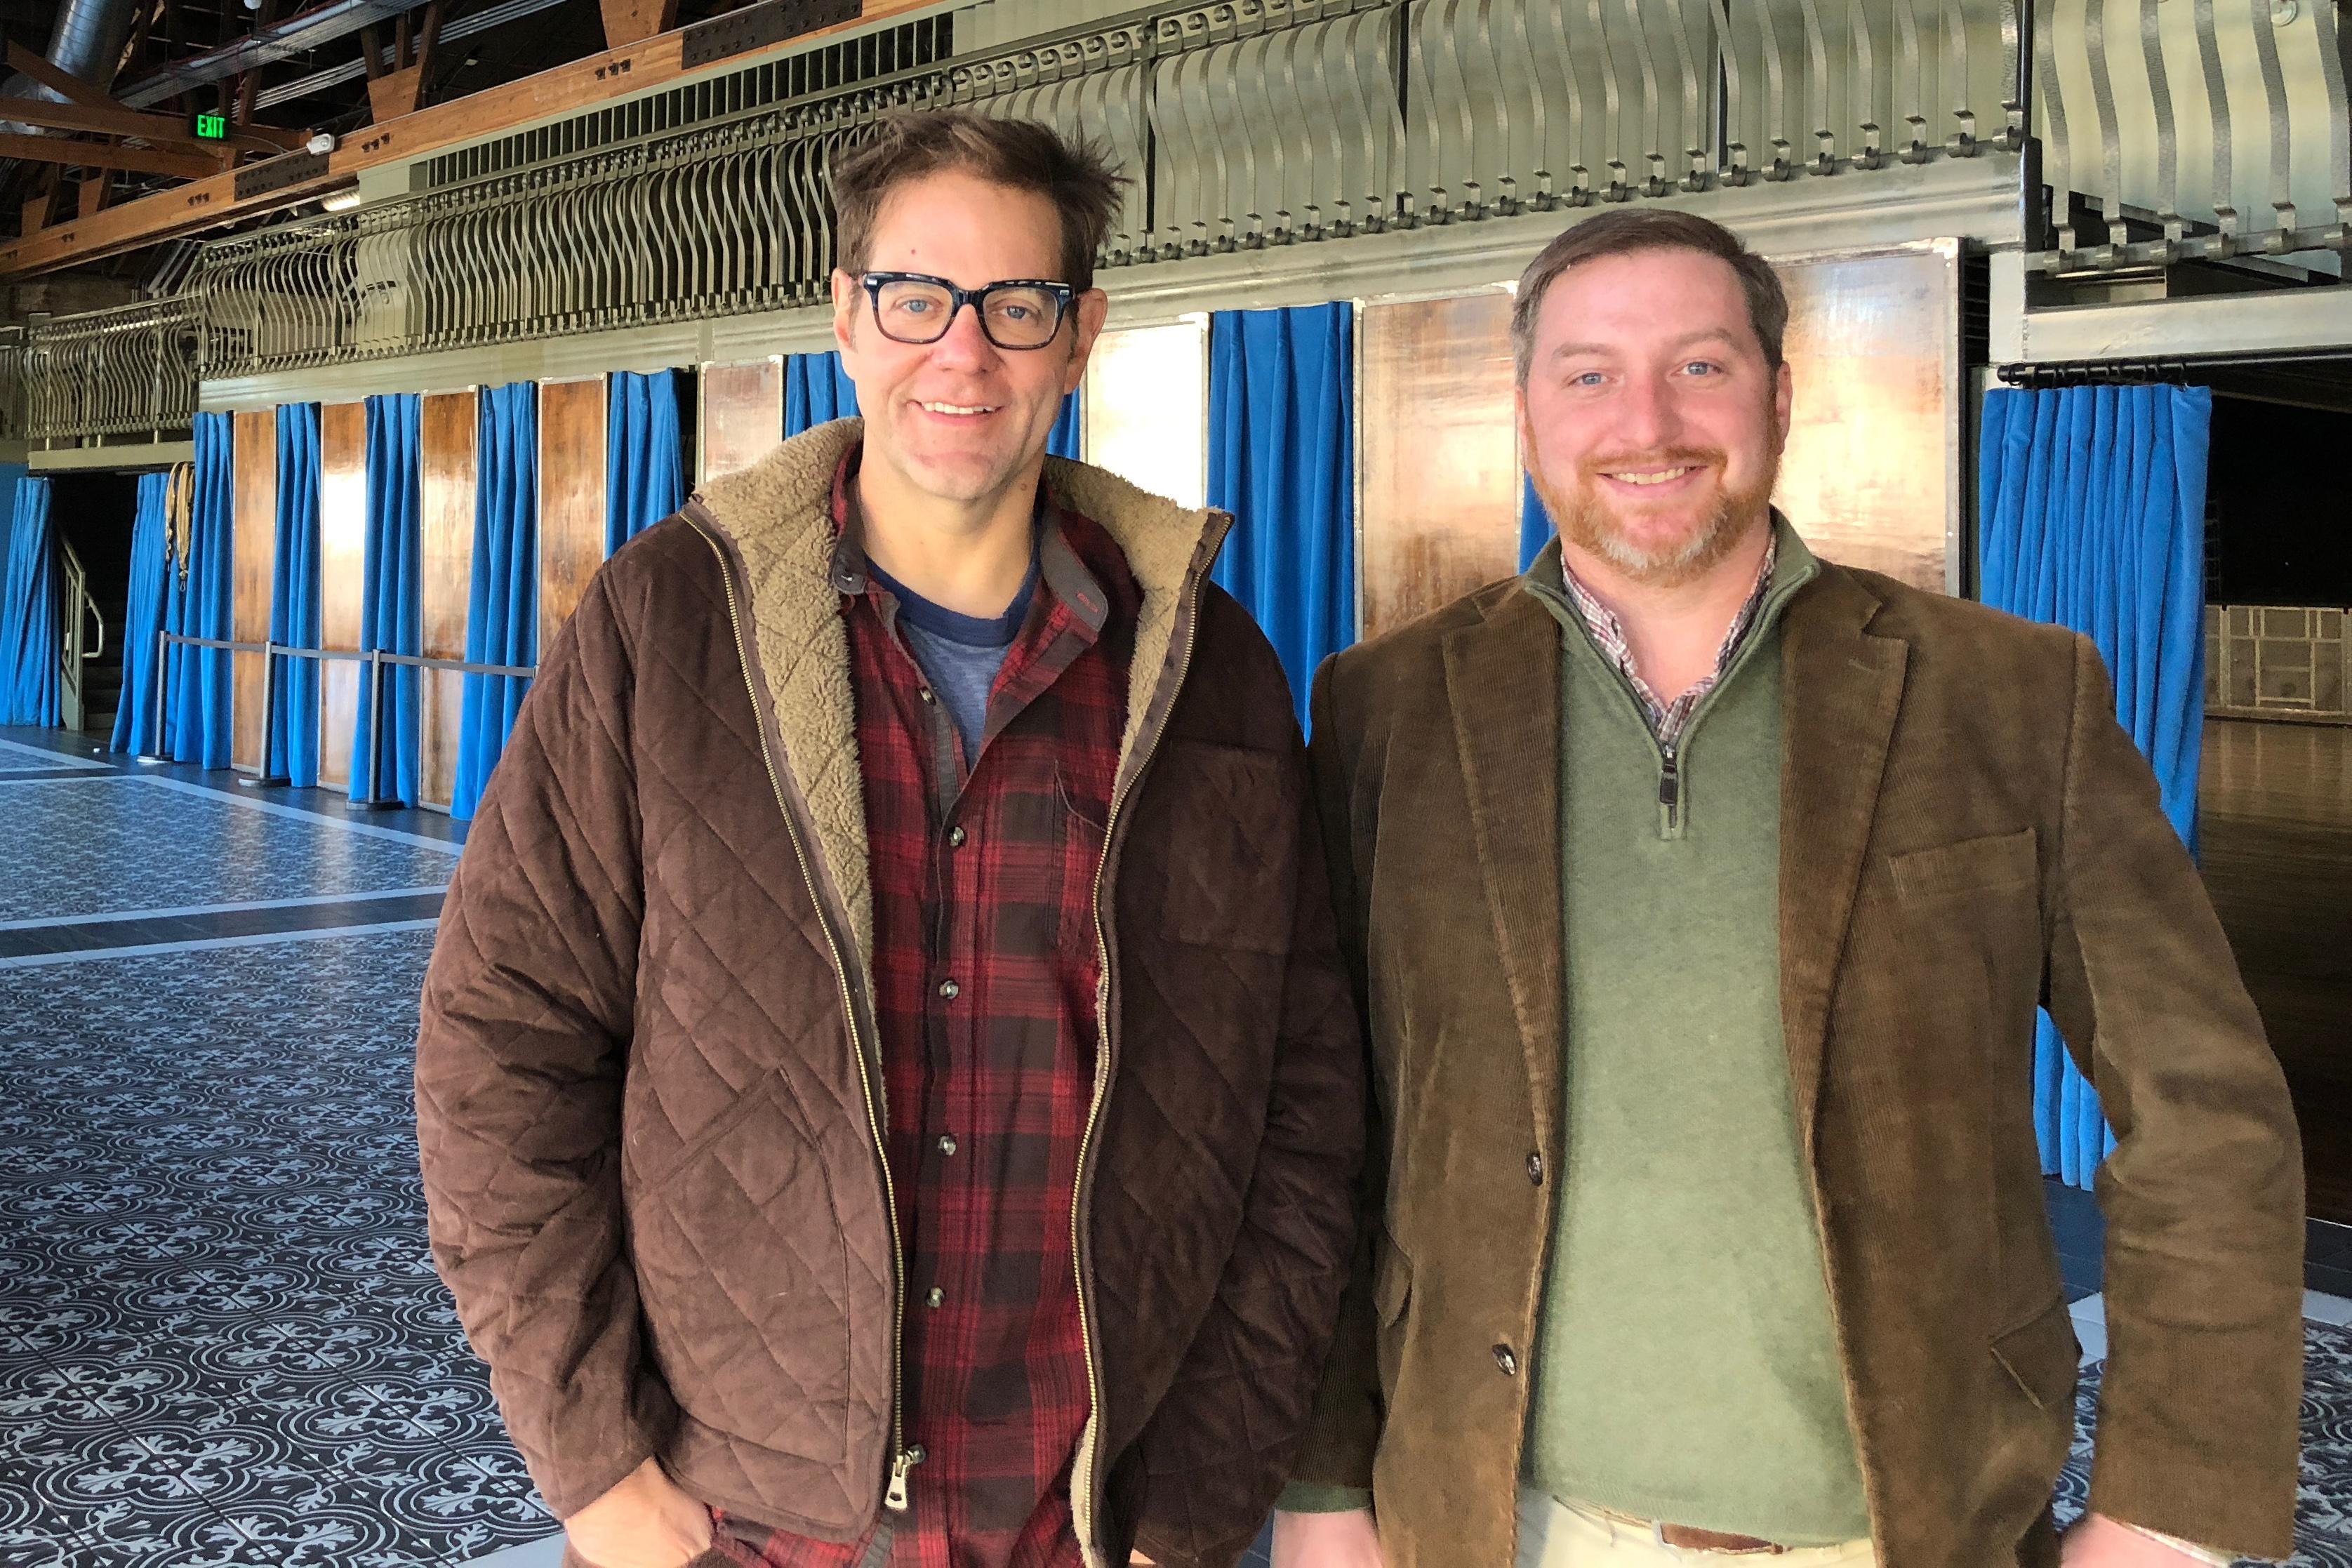 Van Buren partner Charlie Levy and Deputy State Historic Preservation Officer Christopher Cody